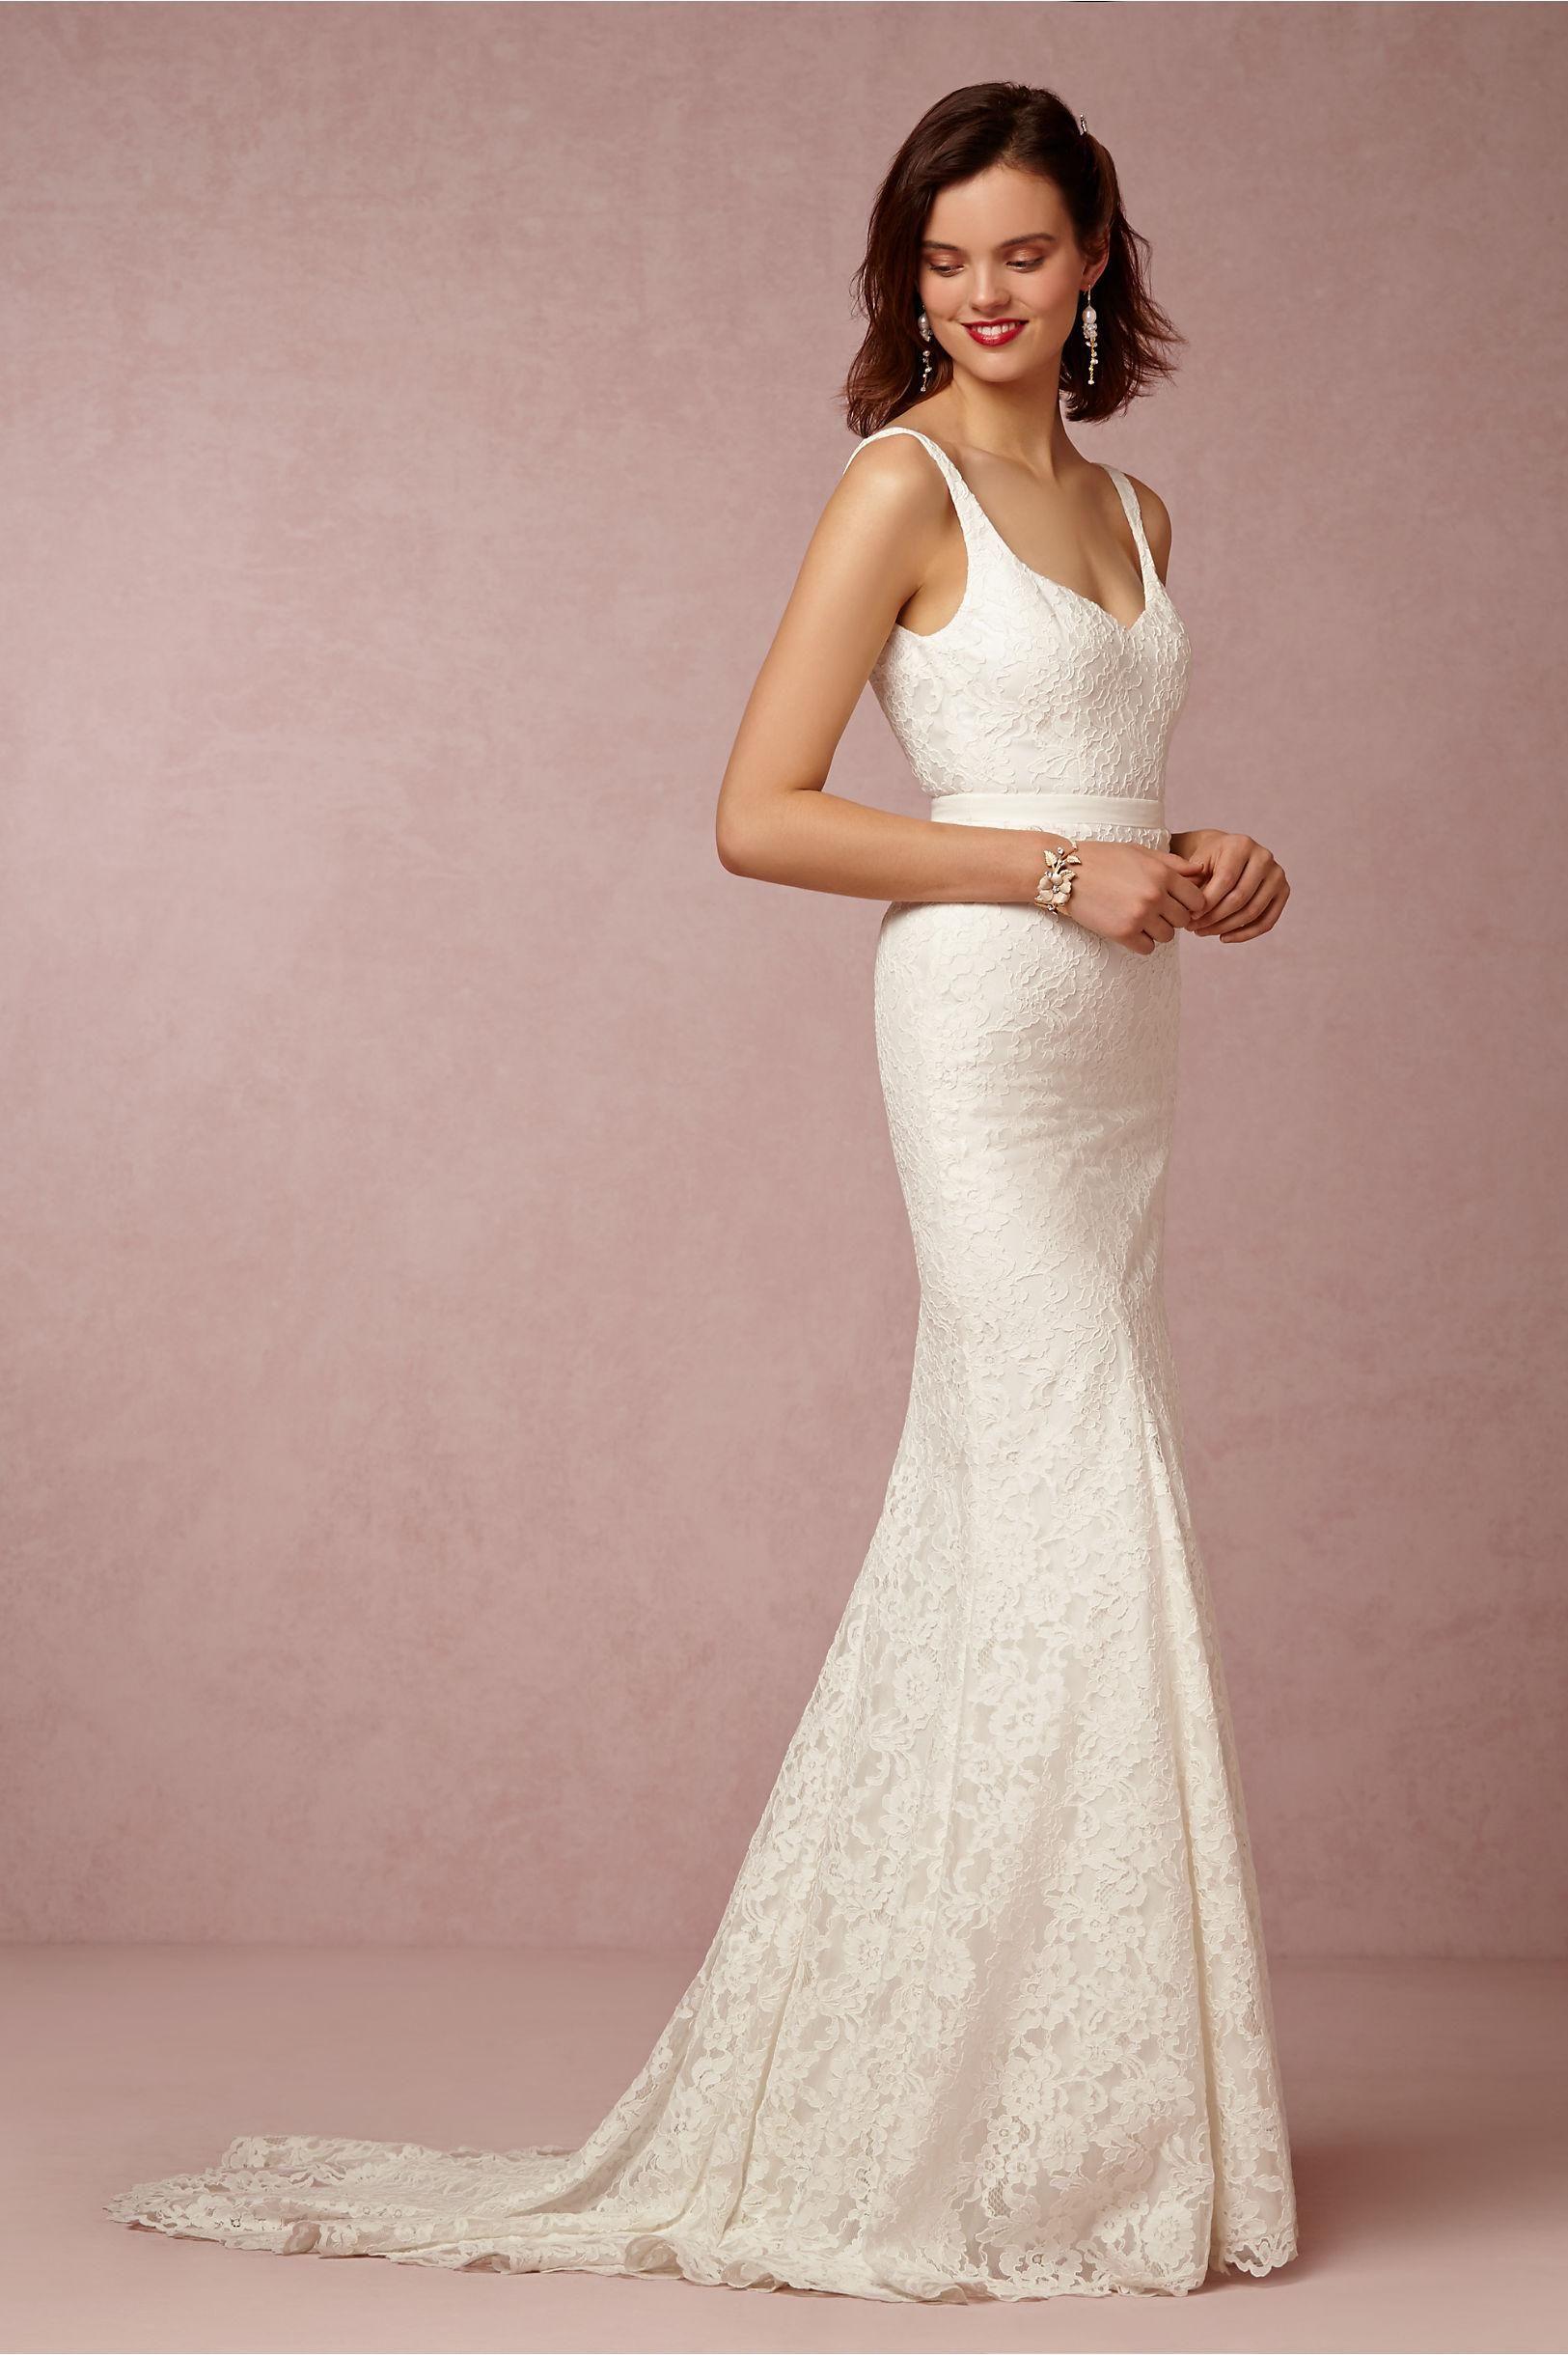 Corset Wedding Dresses Bhldn 2016 Elegant Wedding Dresses V Neck ...